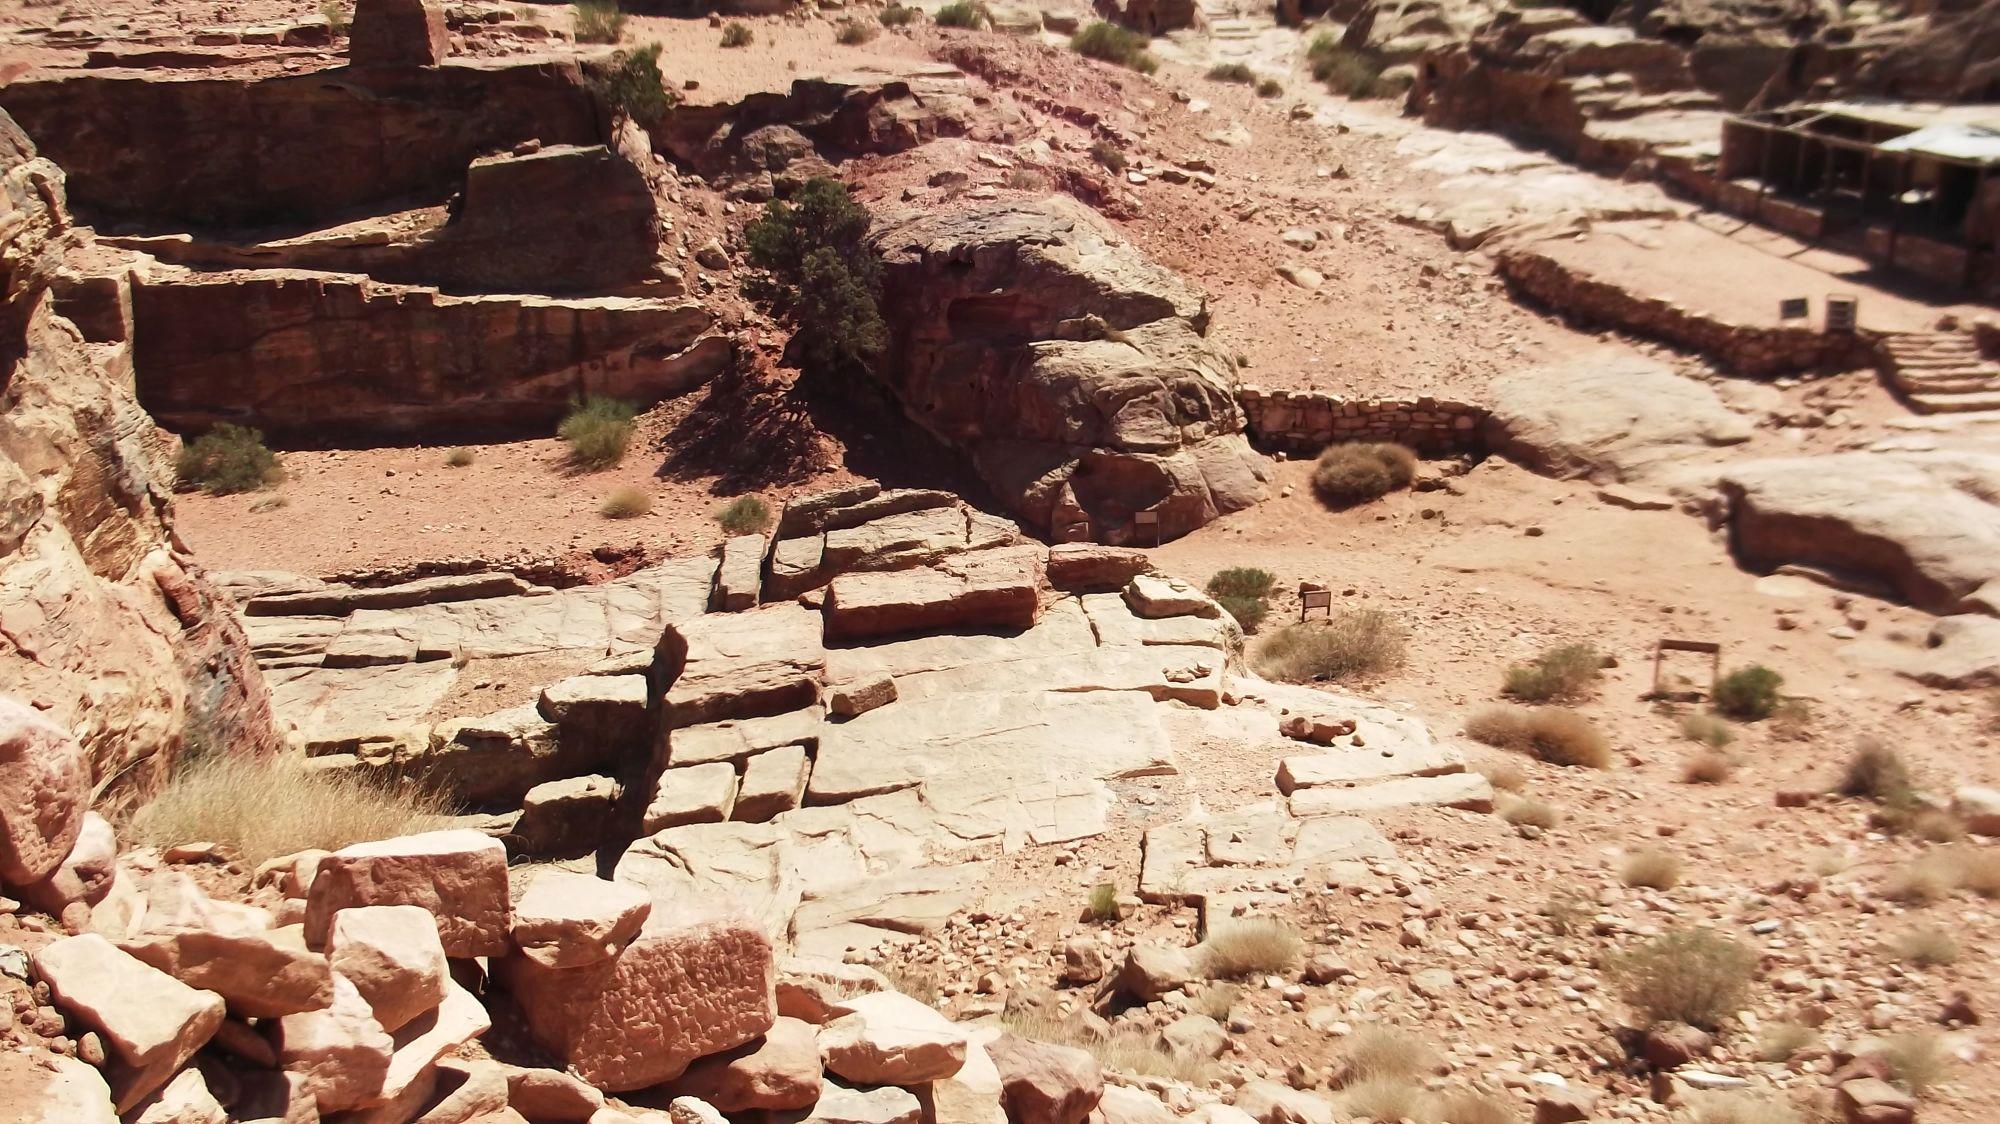 Jordania - Petra część 1 - zdjęcia, atrakcje